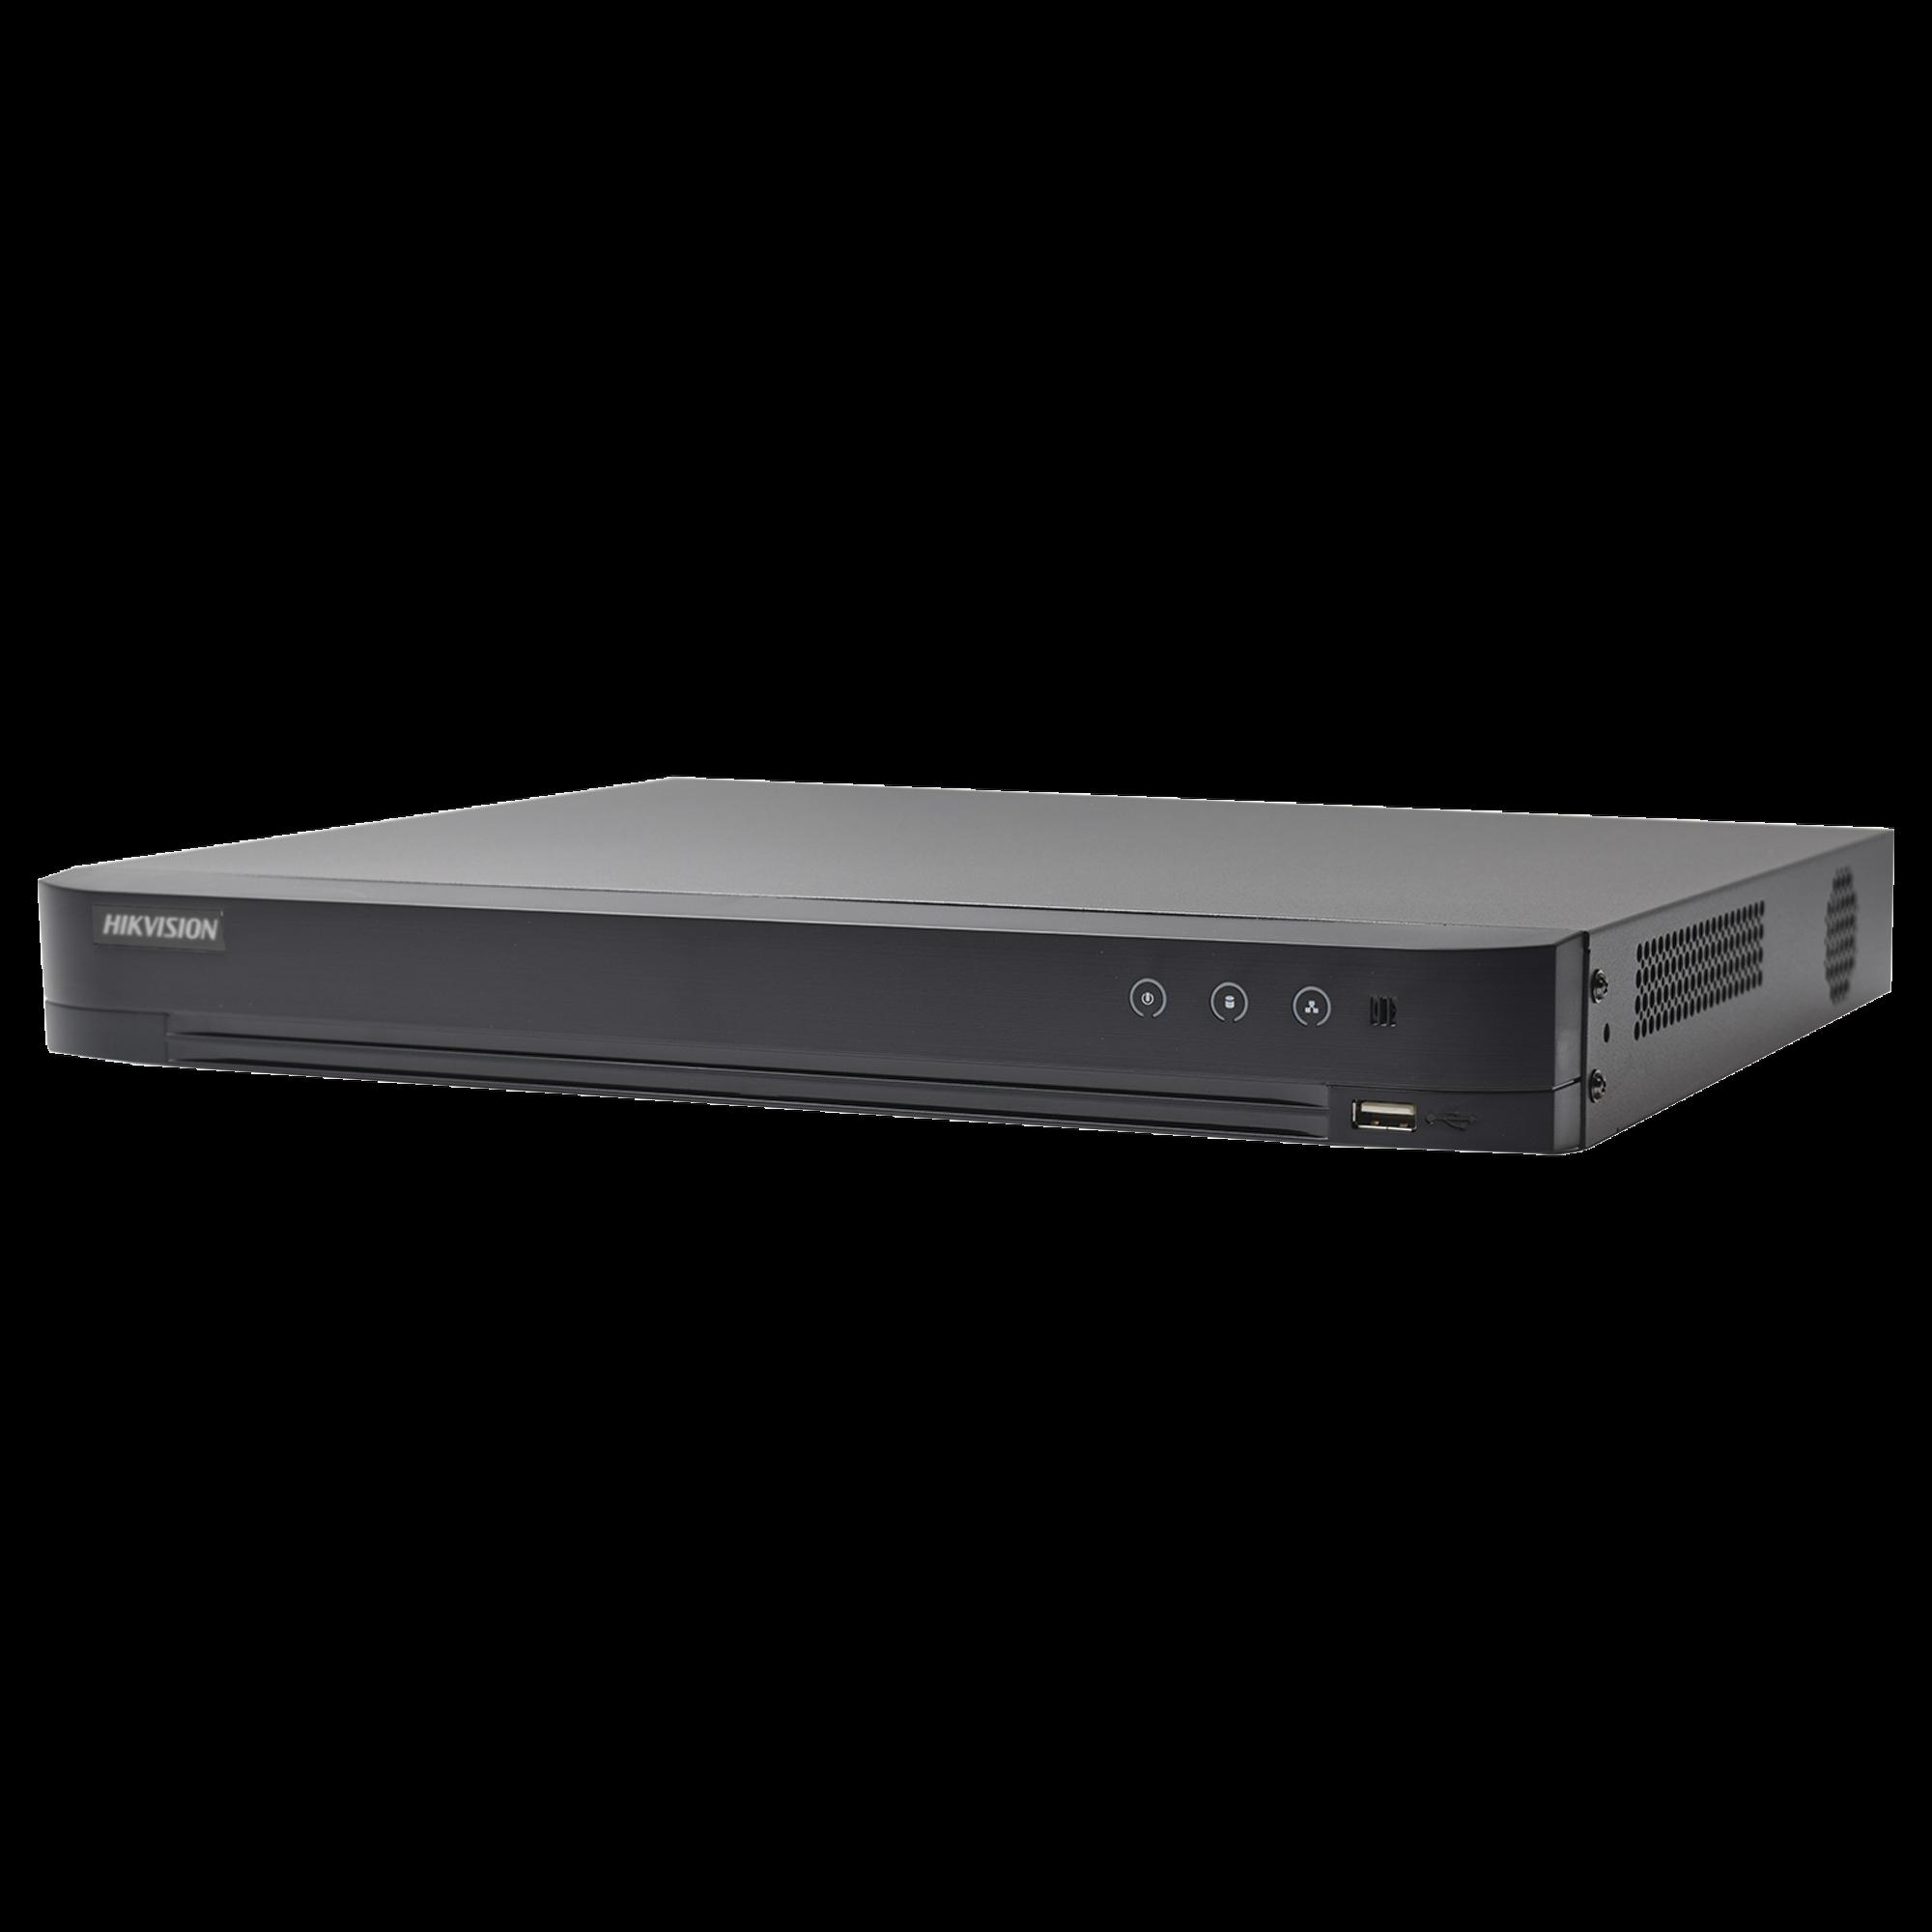 DVR 4 Megapixel / 4 Canales TURBOHD + 2 Canales IP / 1 Bahia de Disco Duro / 1 Canal de Audio / Videoanalisis